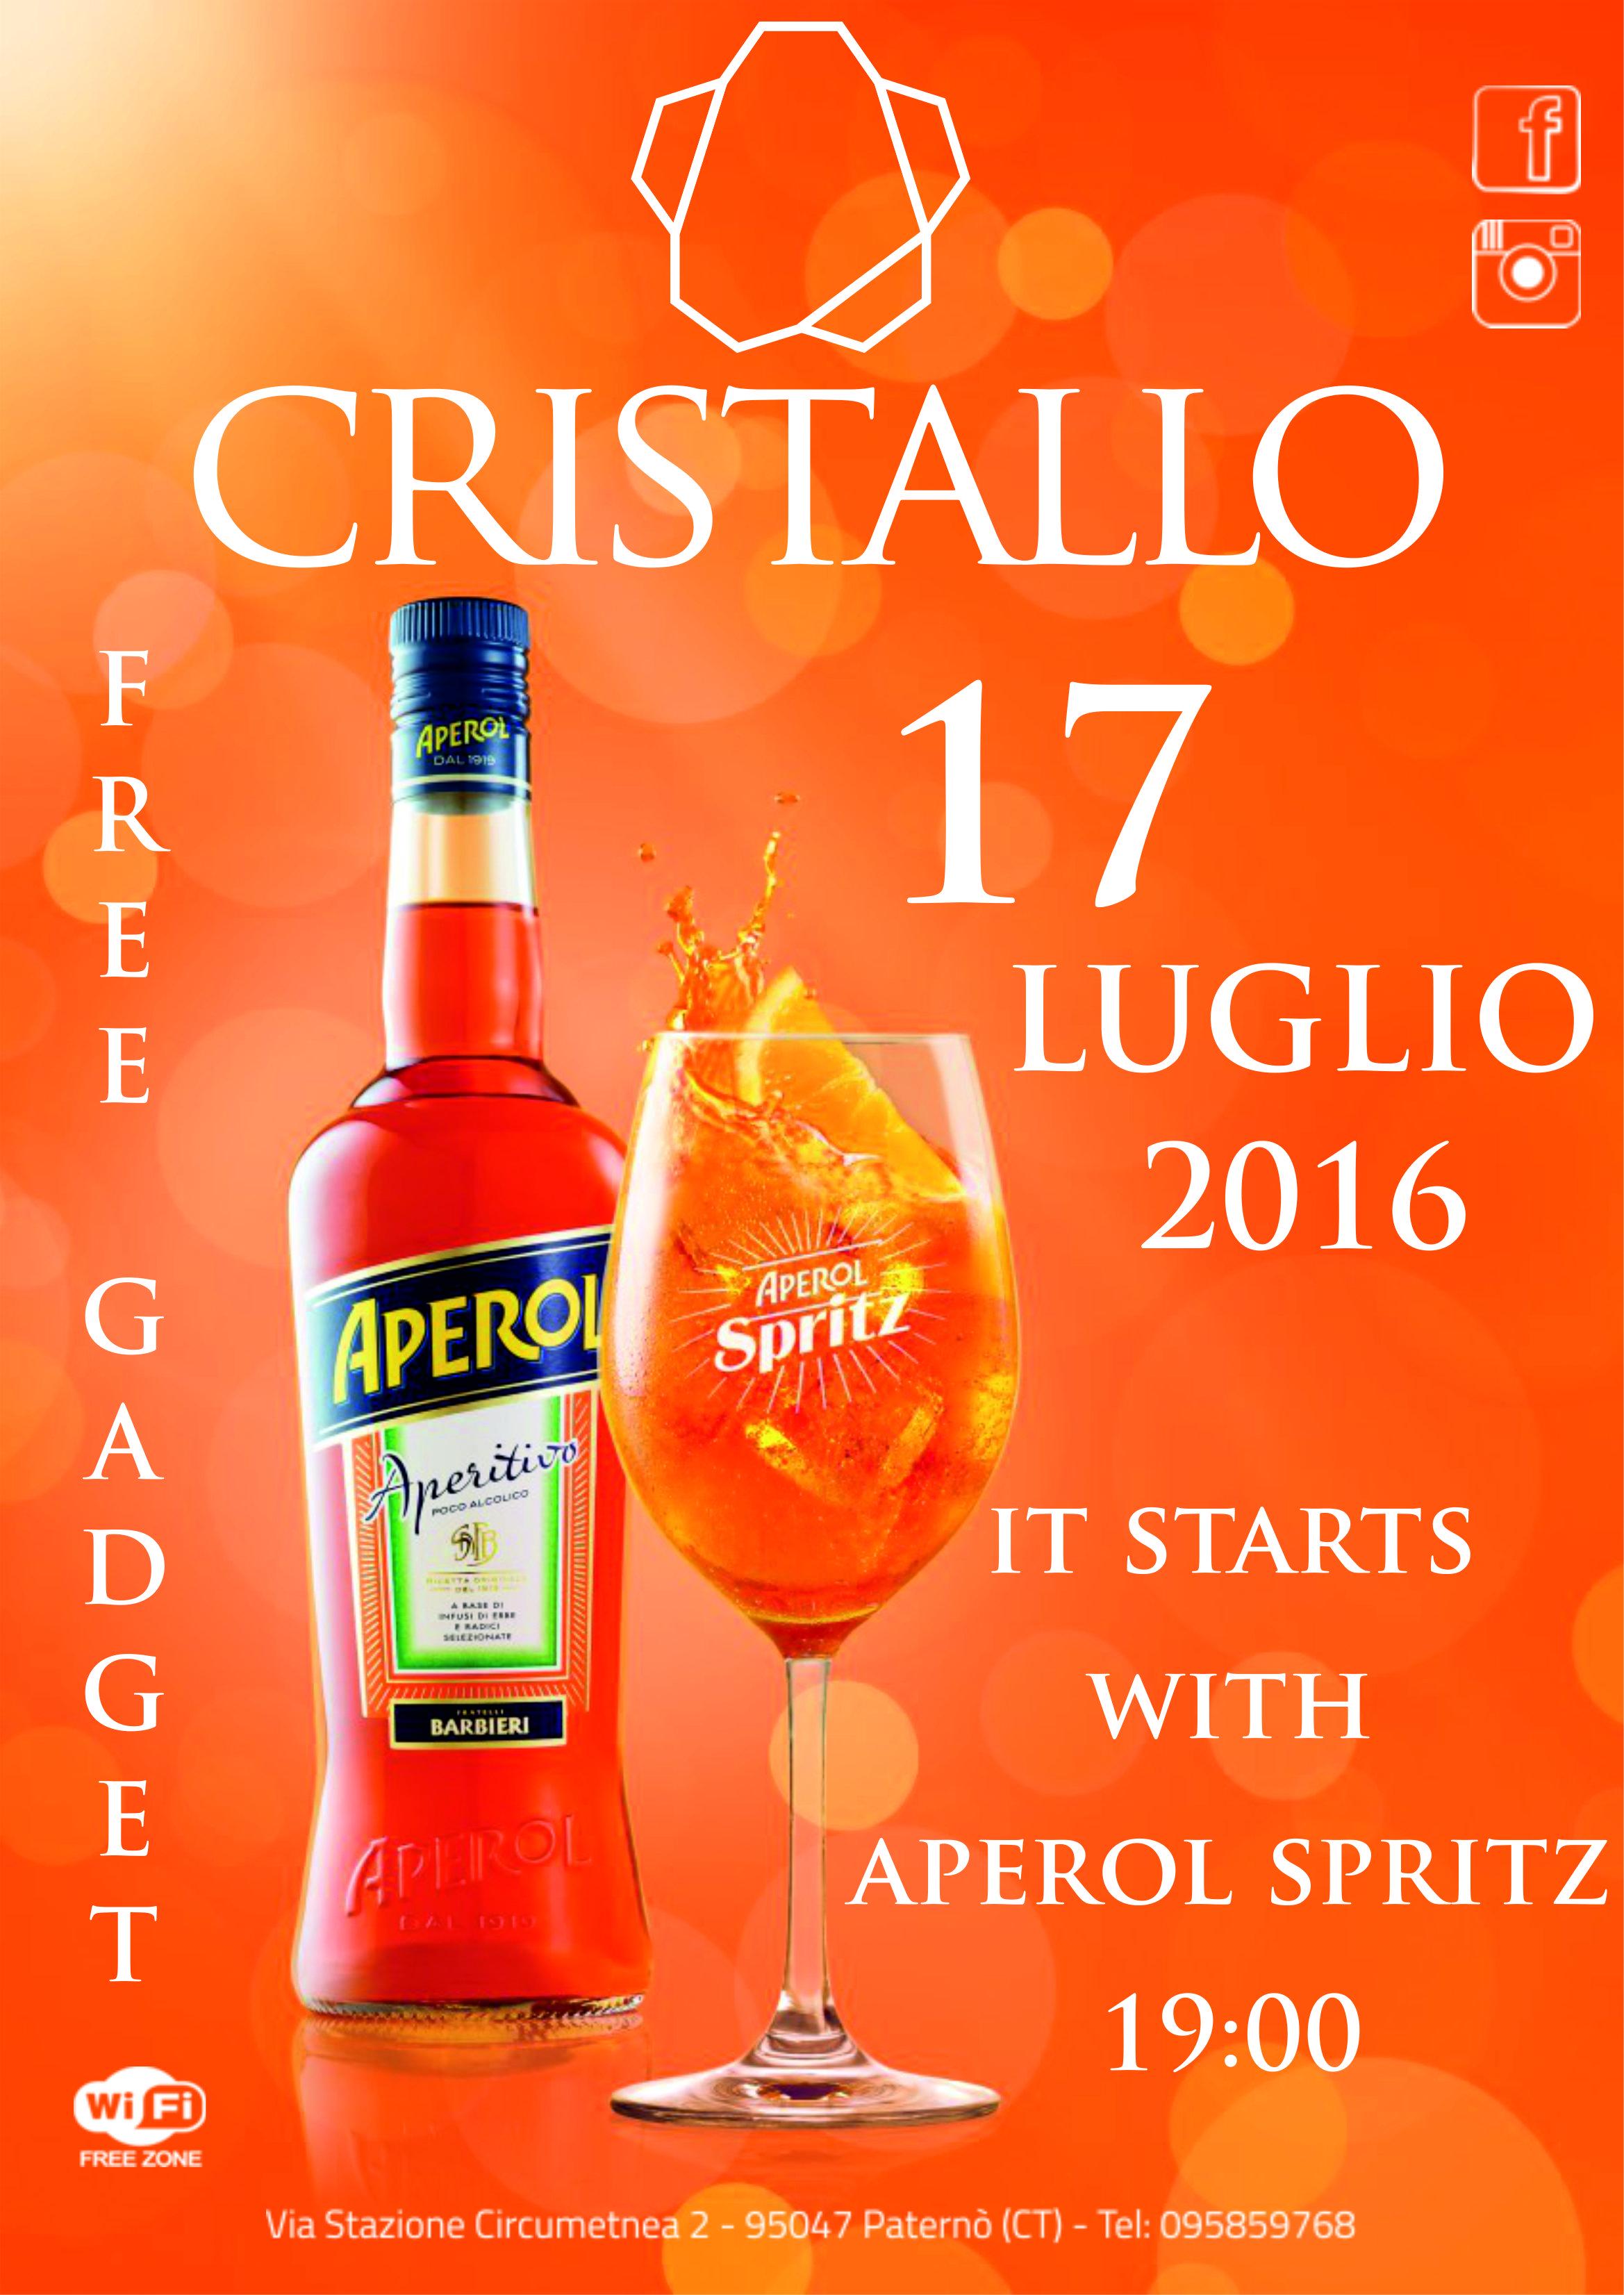 Apero Spritz 17-07-2016